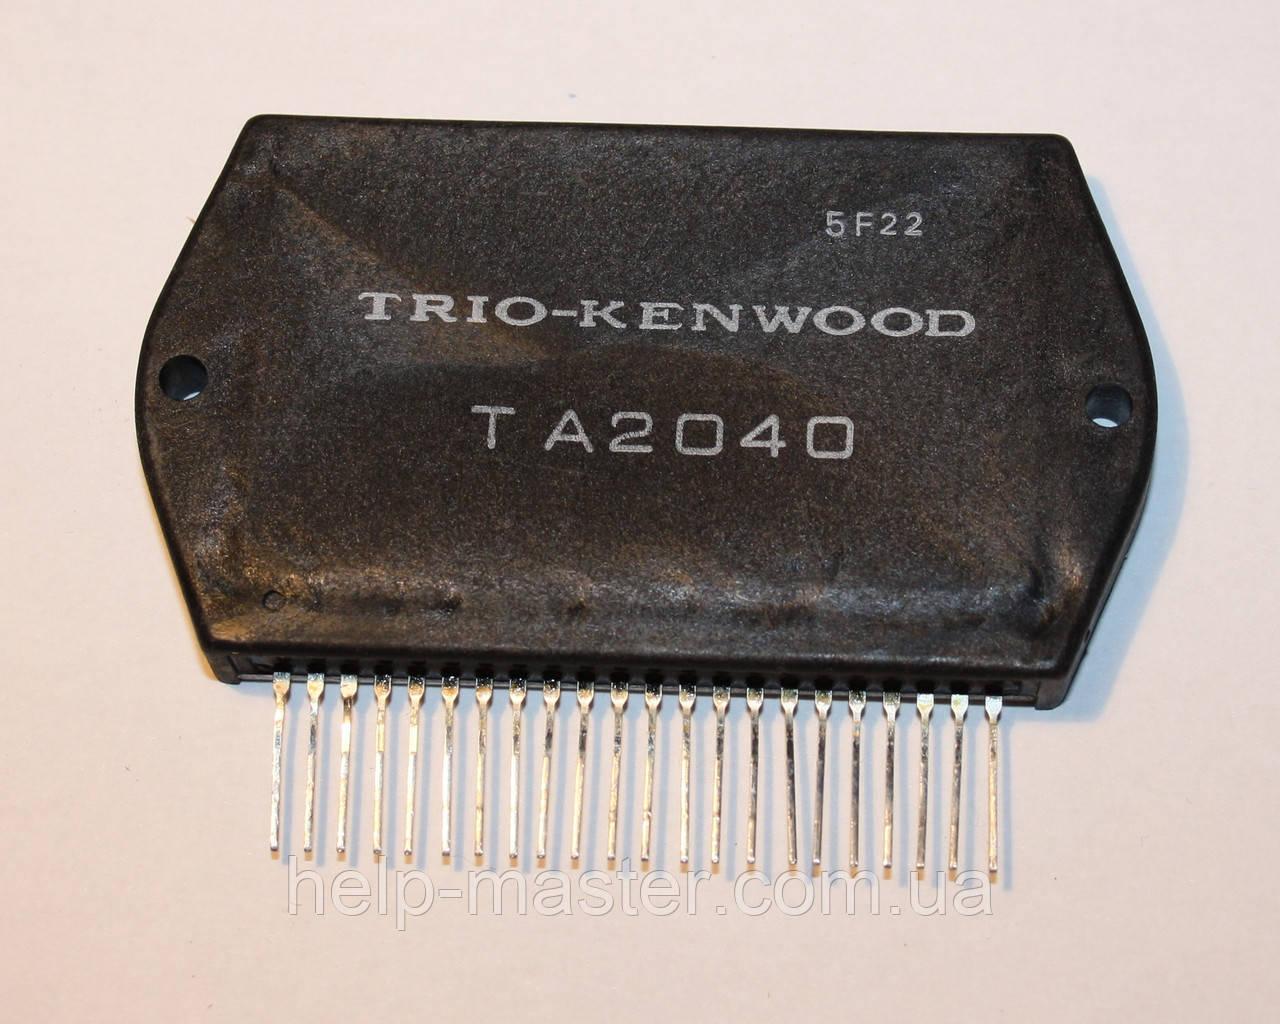 TA2040 (TRIO-KENWOOD)